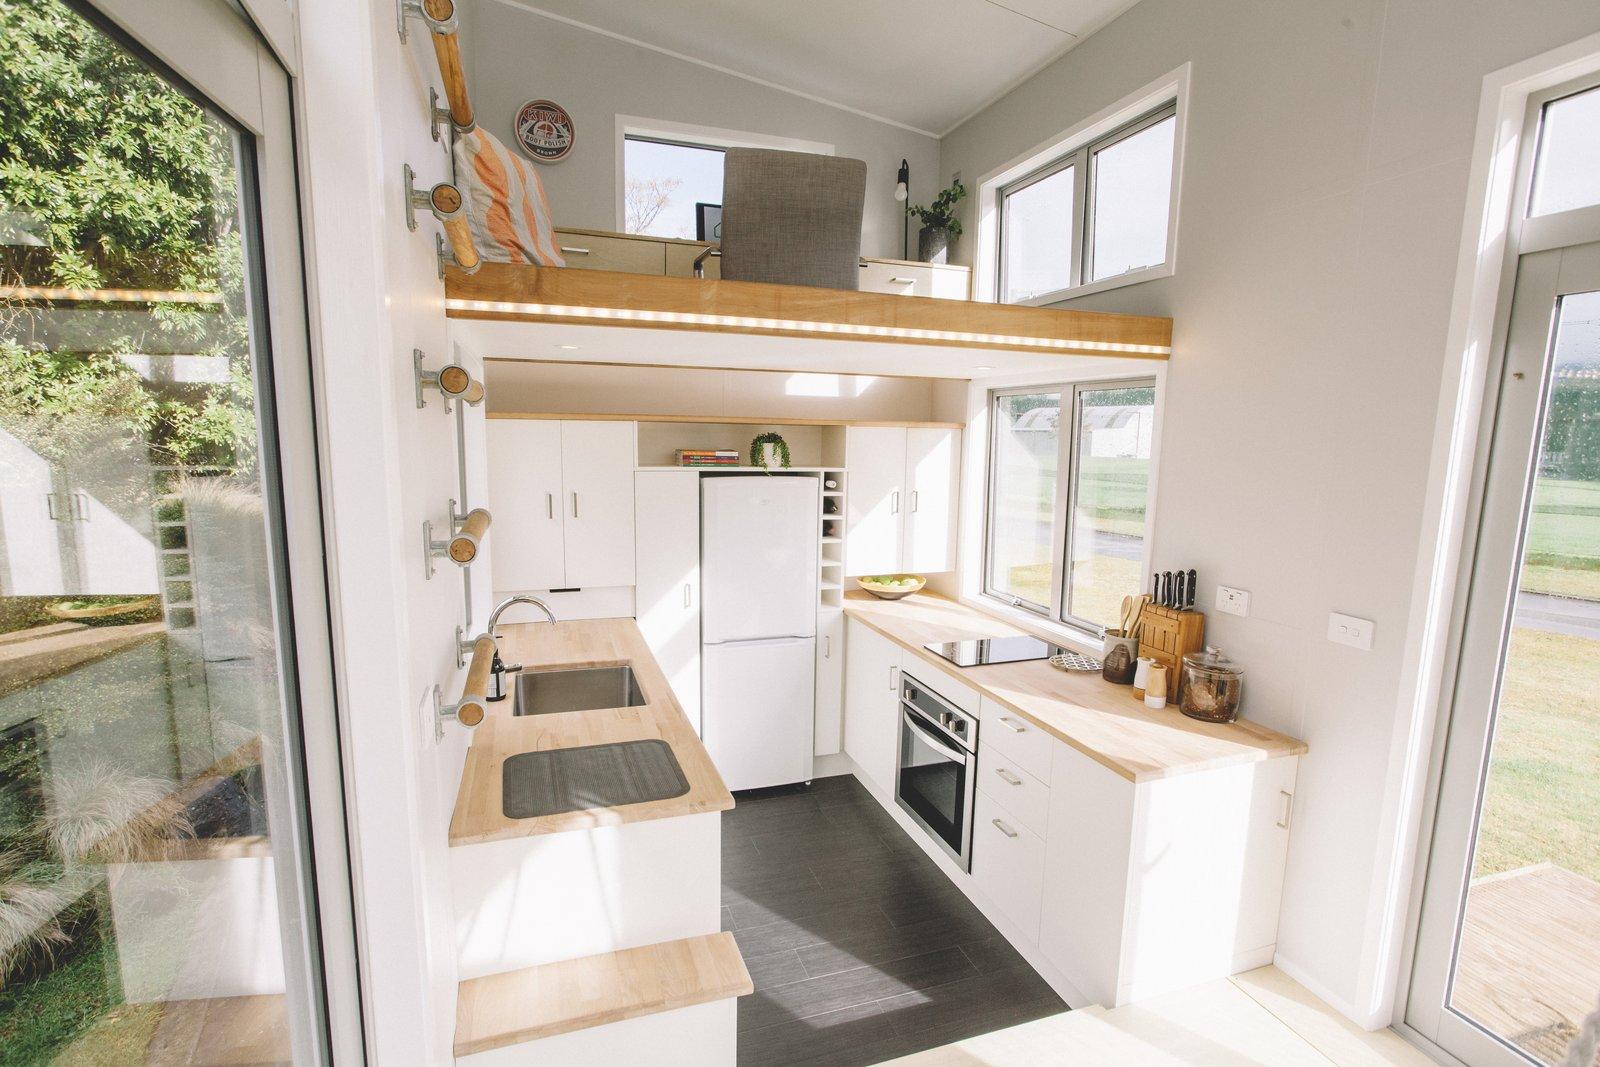 Millennial Tiny House kitchen